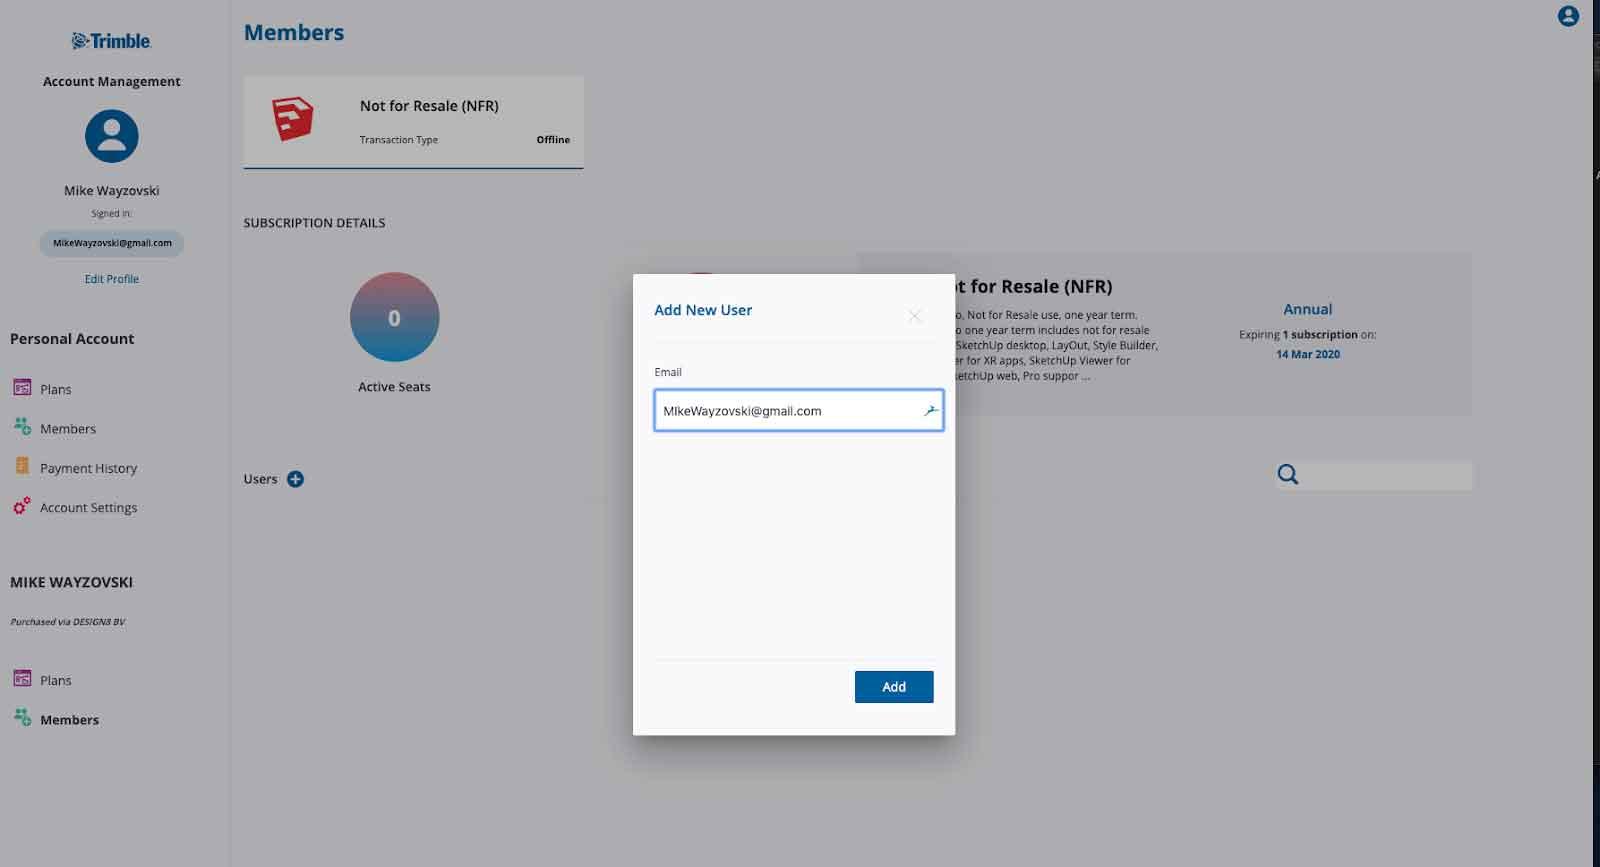 Account Management Portal e-mail adres invullen